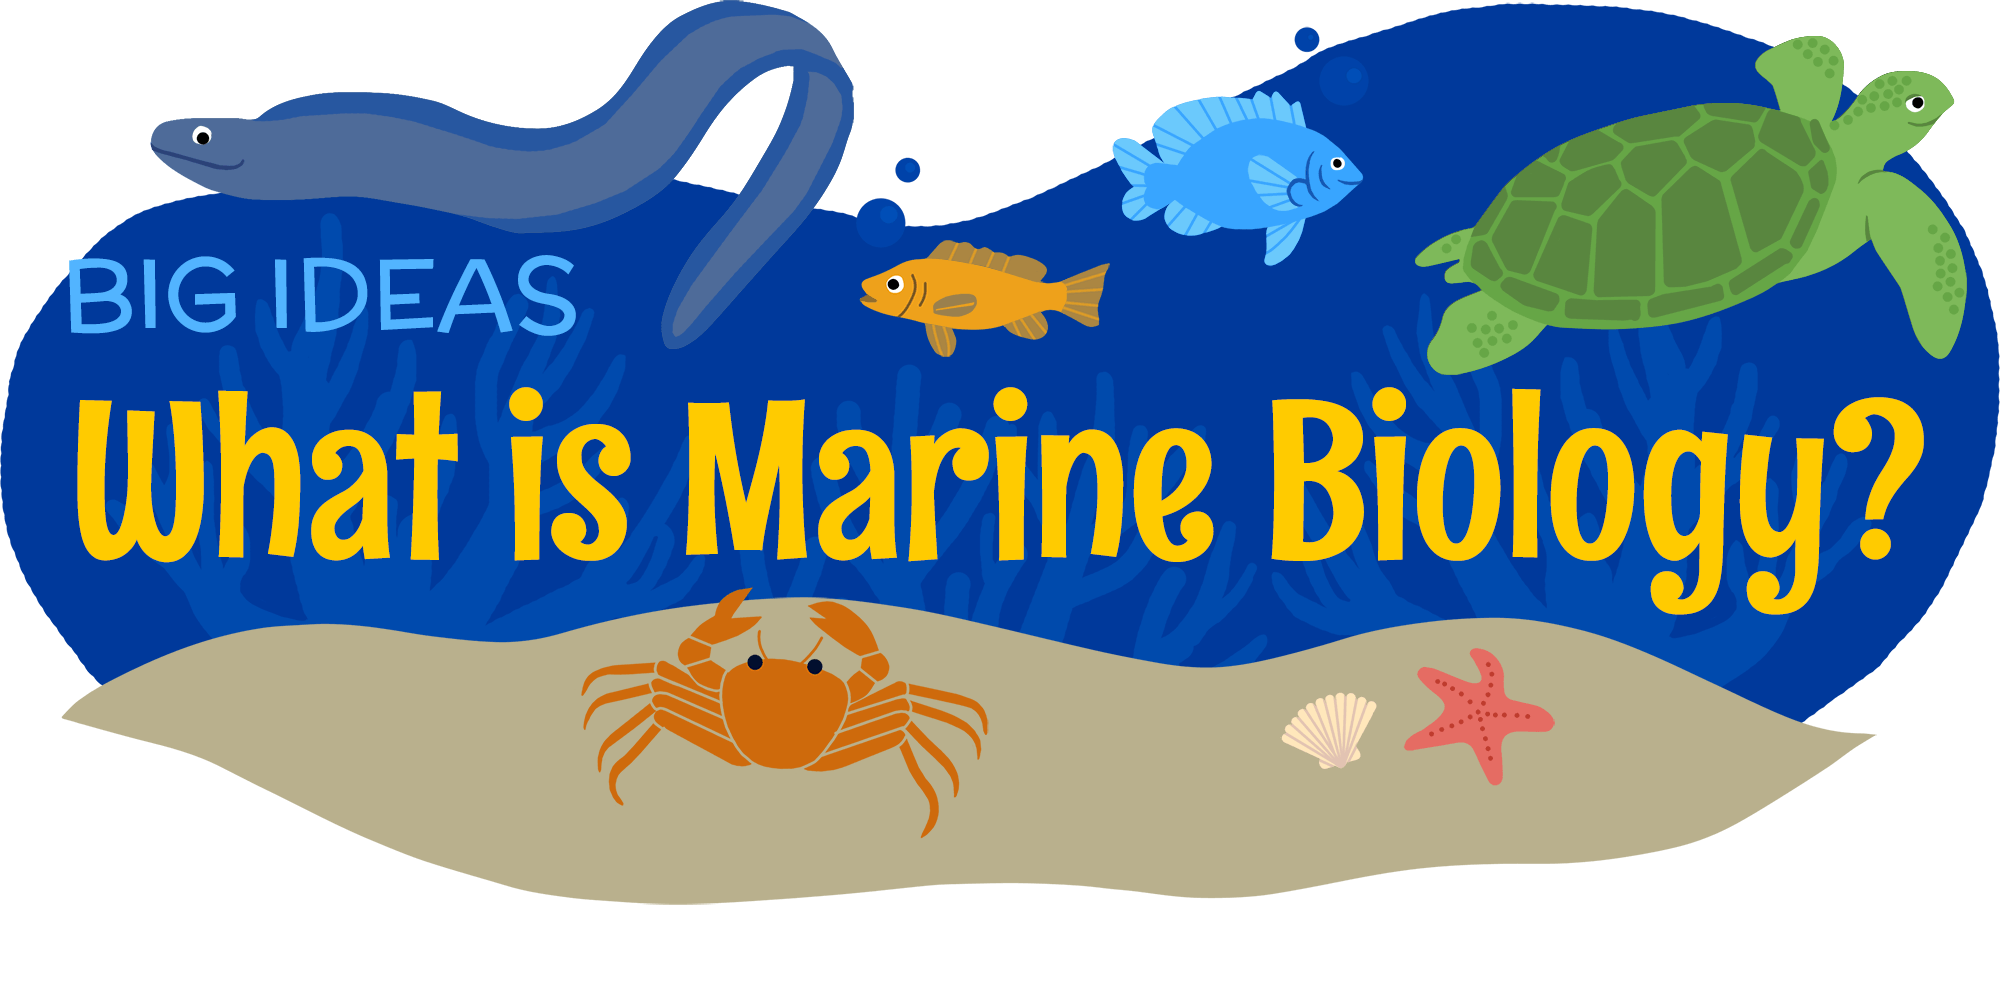 Marine biologist clipart 1 » Clipart Portal.